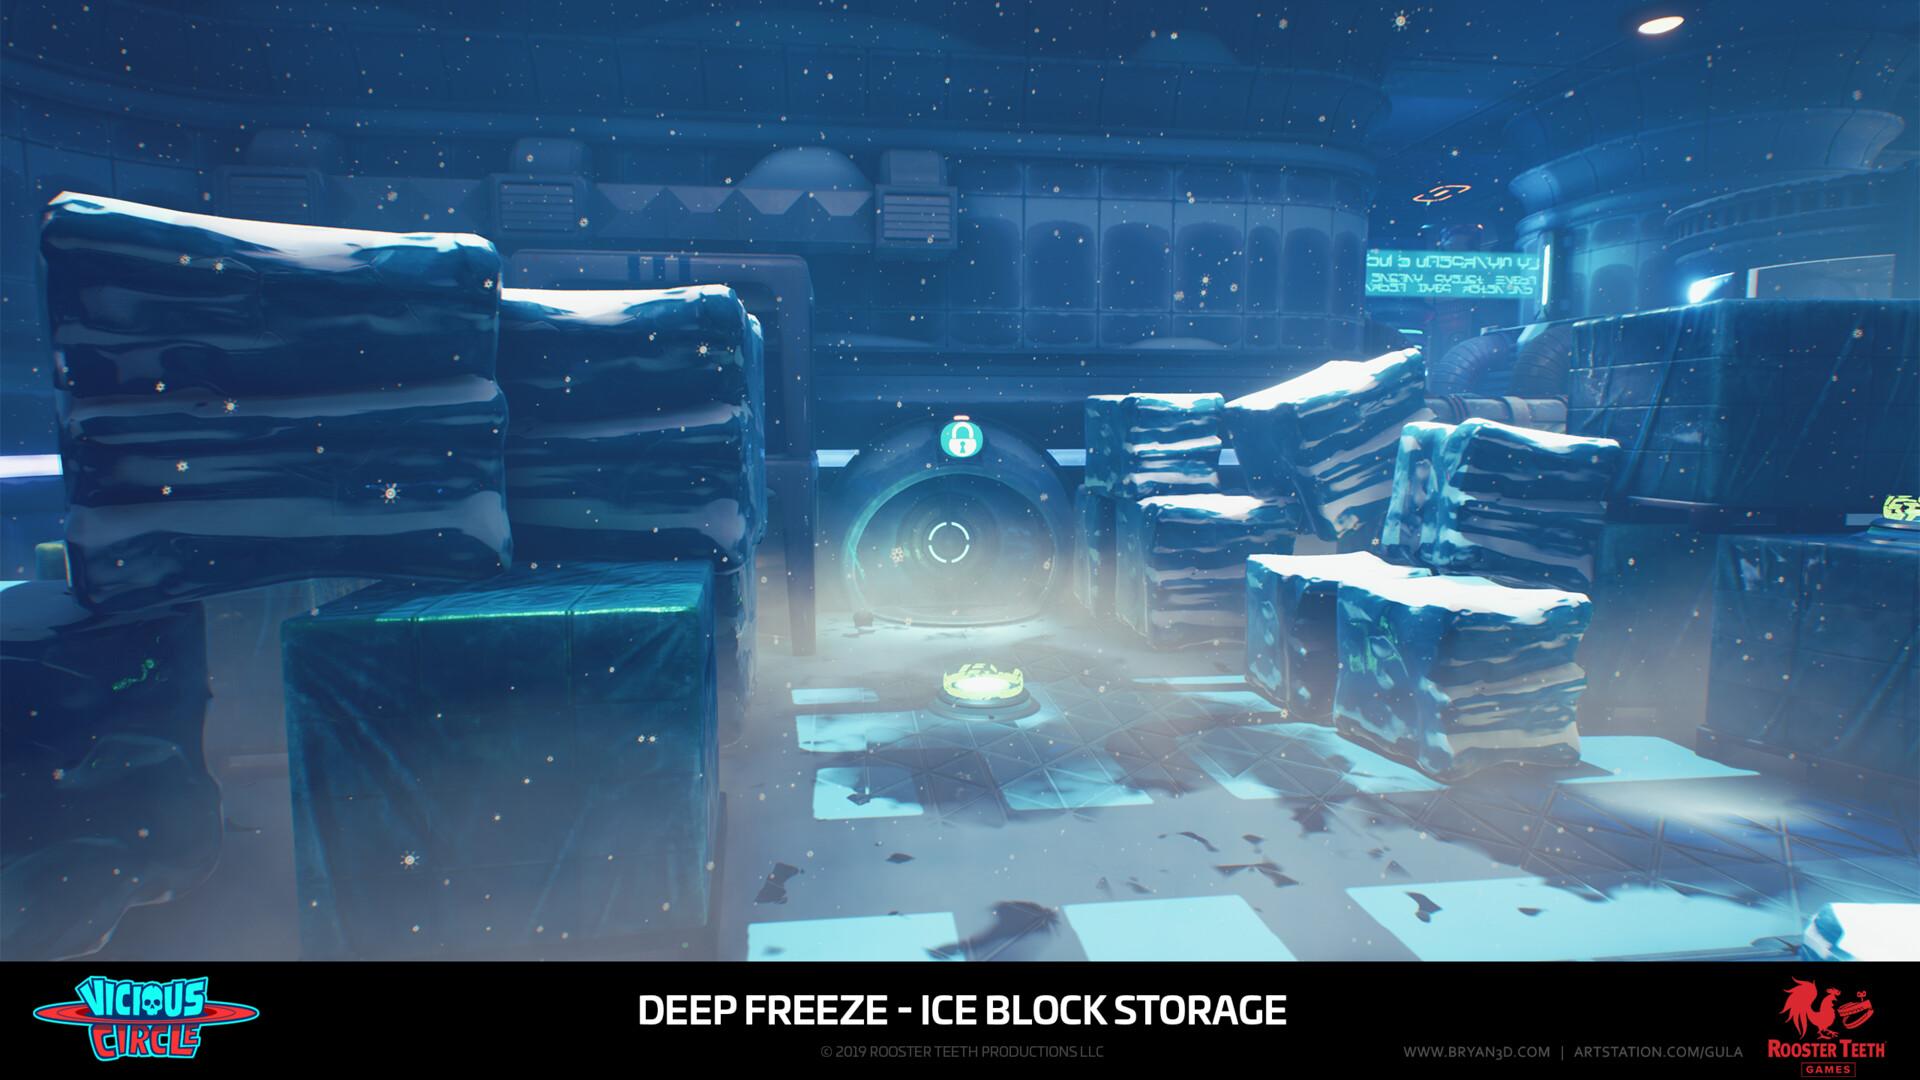 Bryan shannon 002 deepfreezeiceblock